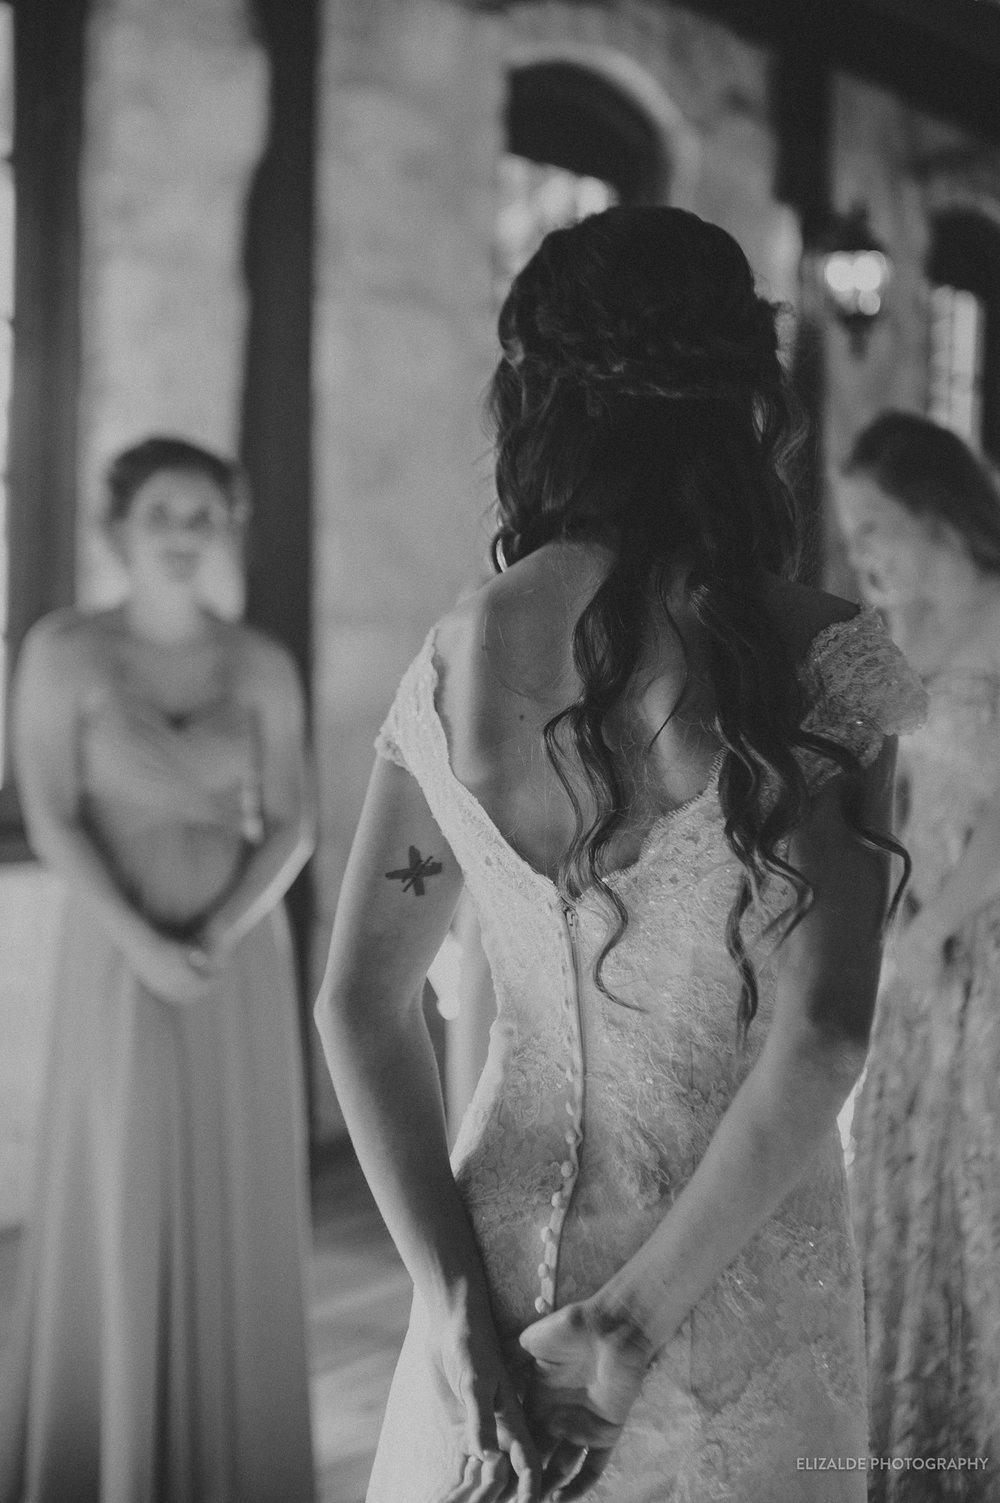 Wedding Photographer Dallas_ DFW Wedding Photographer_elizalde photography_wedding photography (42 of 220).jpg